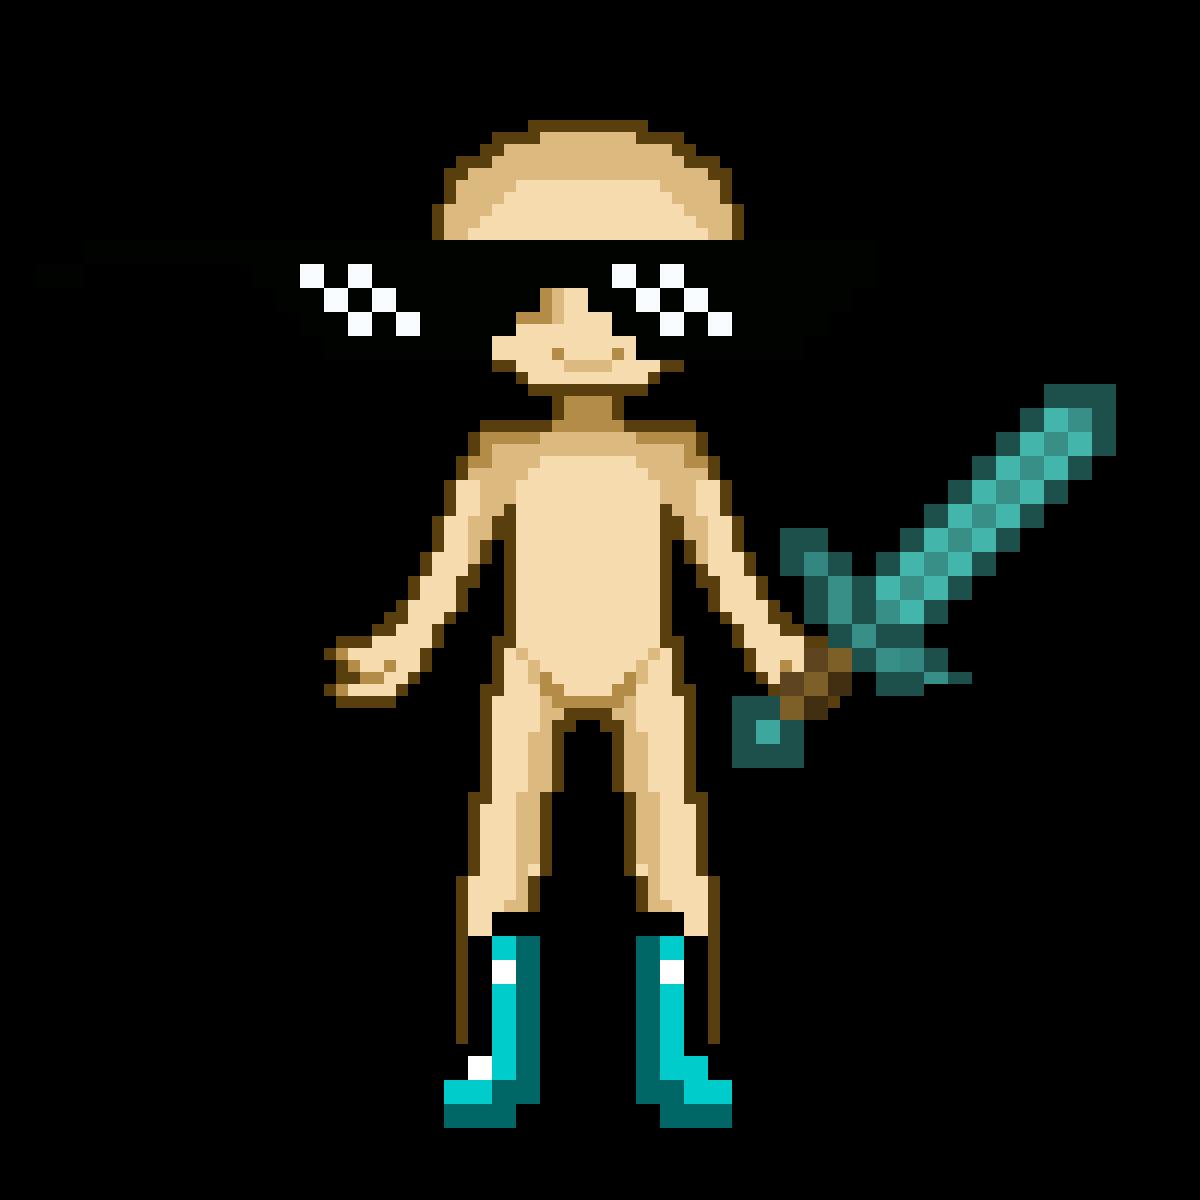 Transparent man vs nature clipart - Man Ho Minecraft - Yuri Death Gif